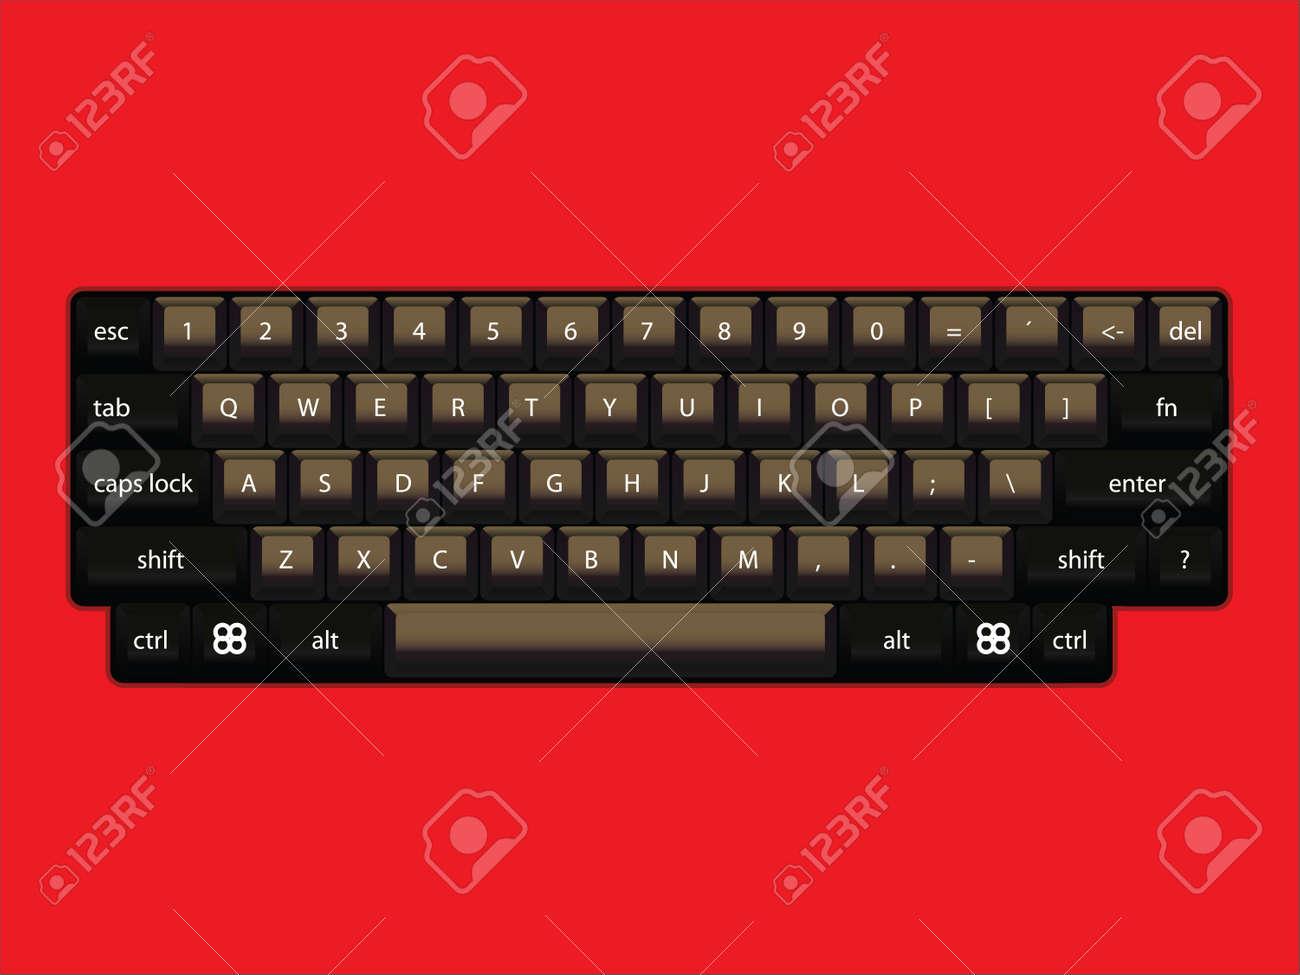 isoated computer keyboard layout - realistic illustration